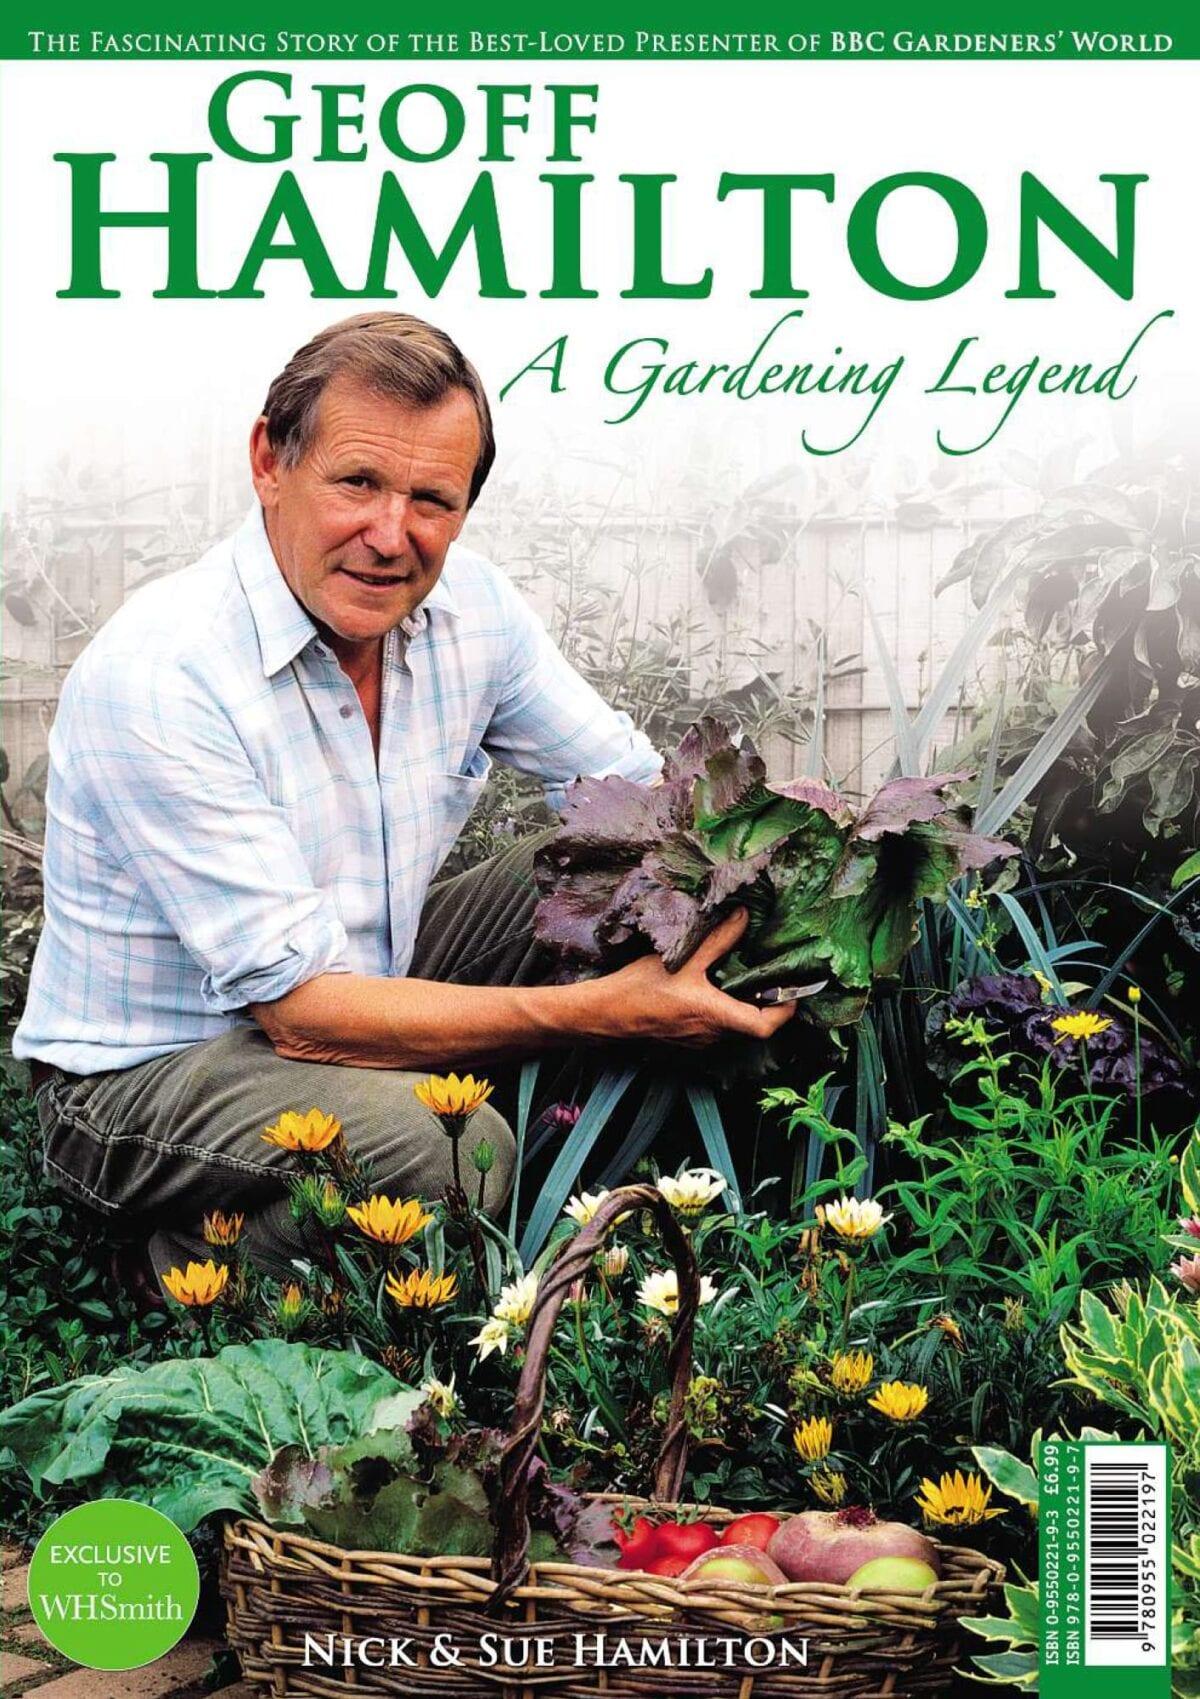 Geoff Hamilton - A Gardening Legend